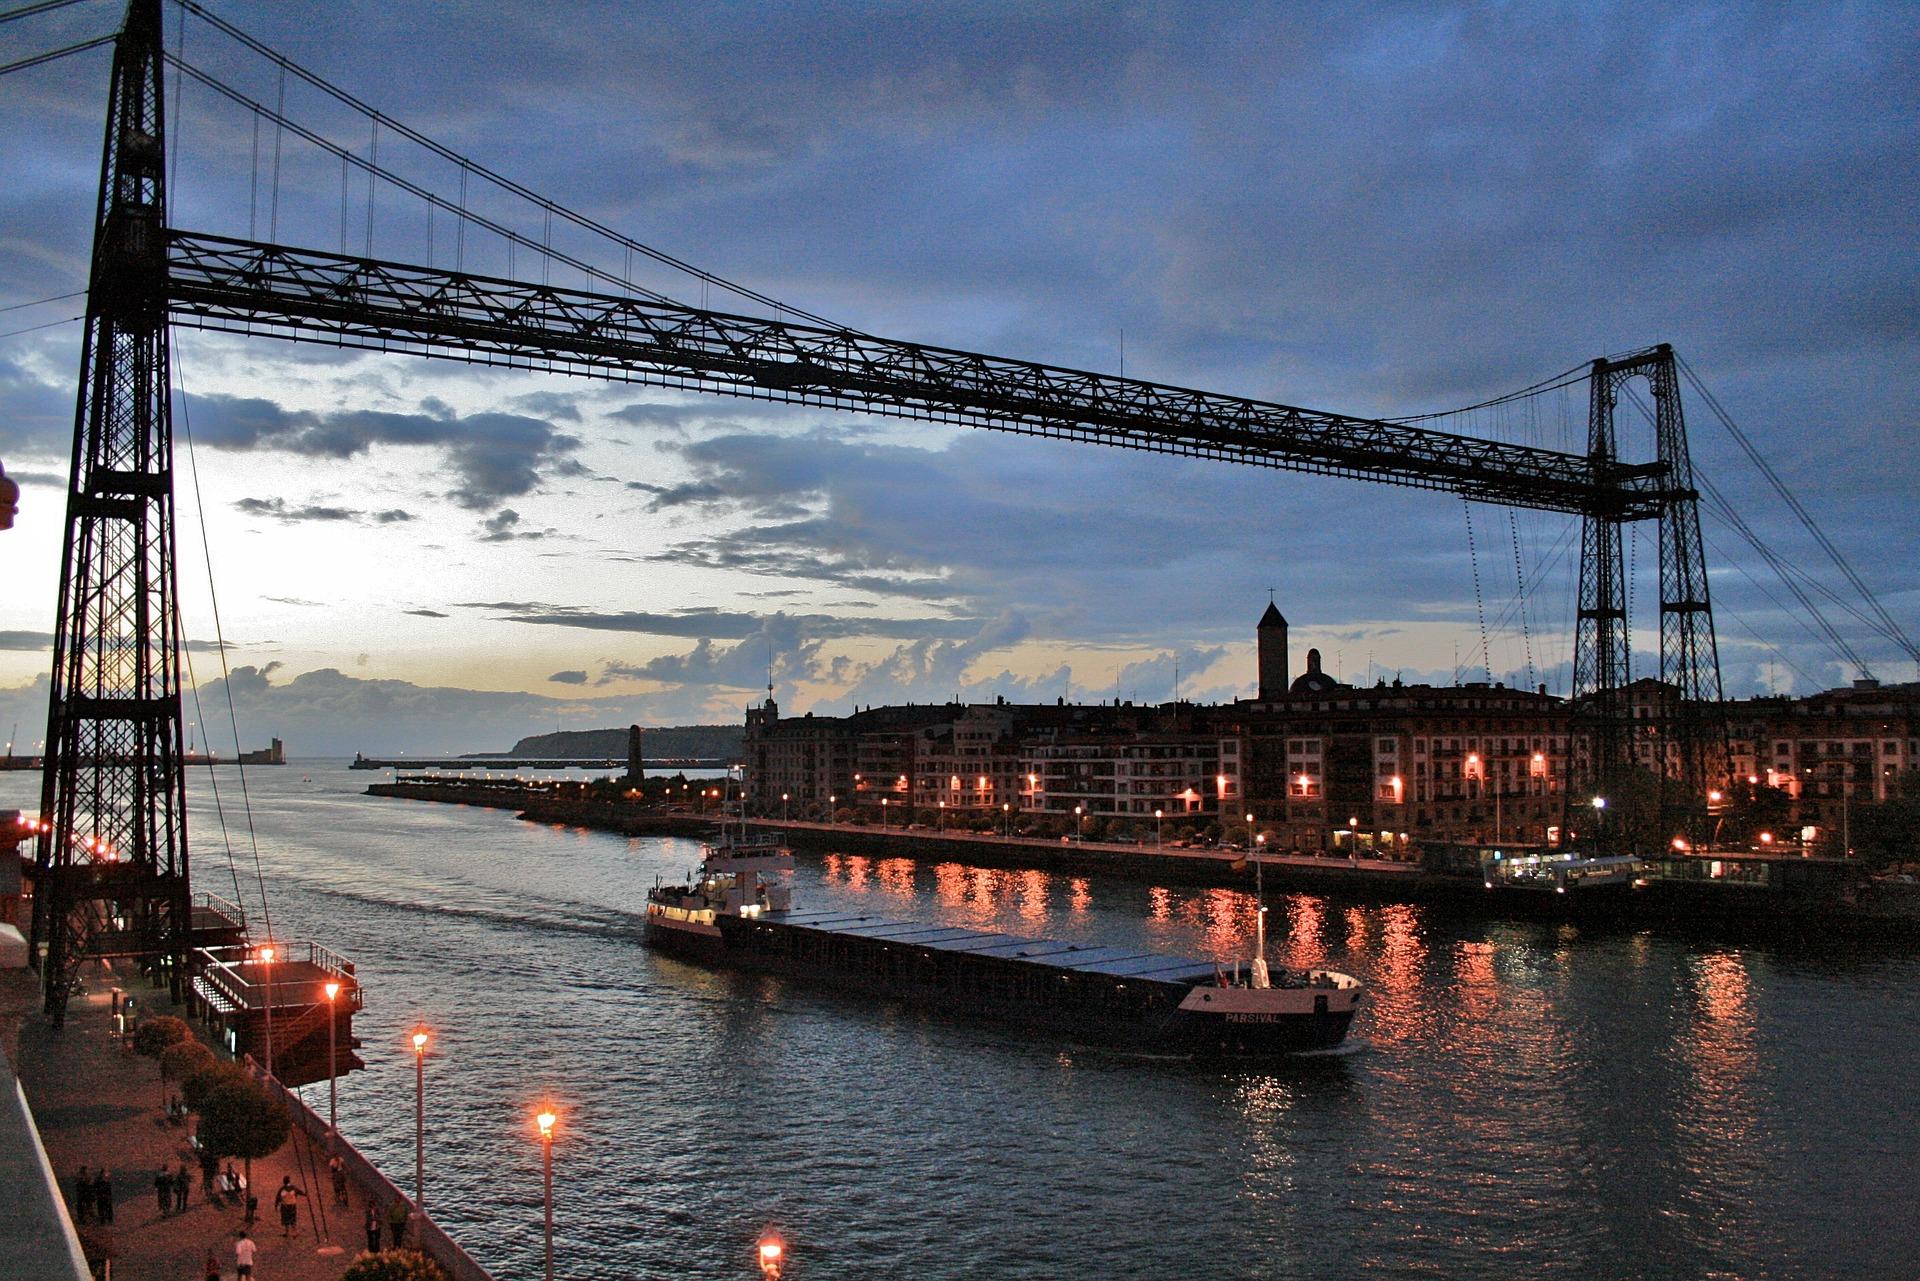 puente-portugalete-2007812_1920